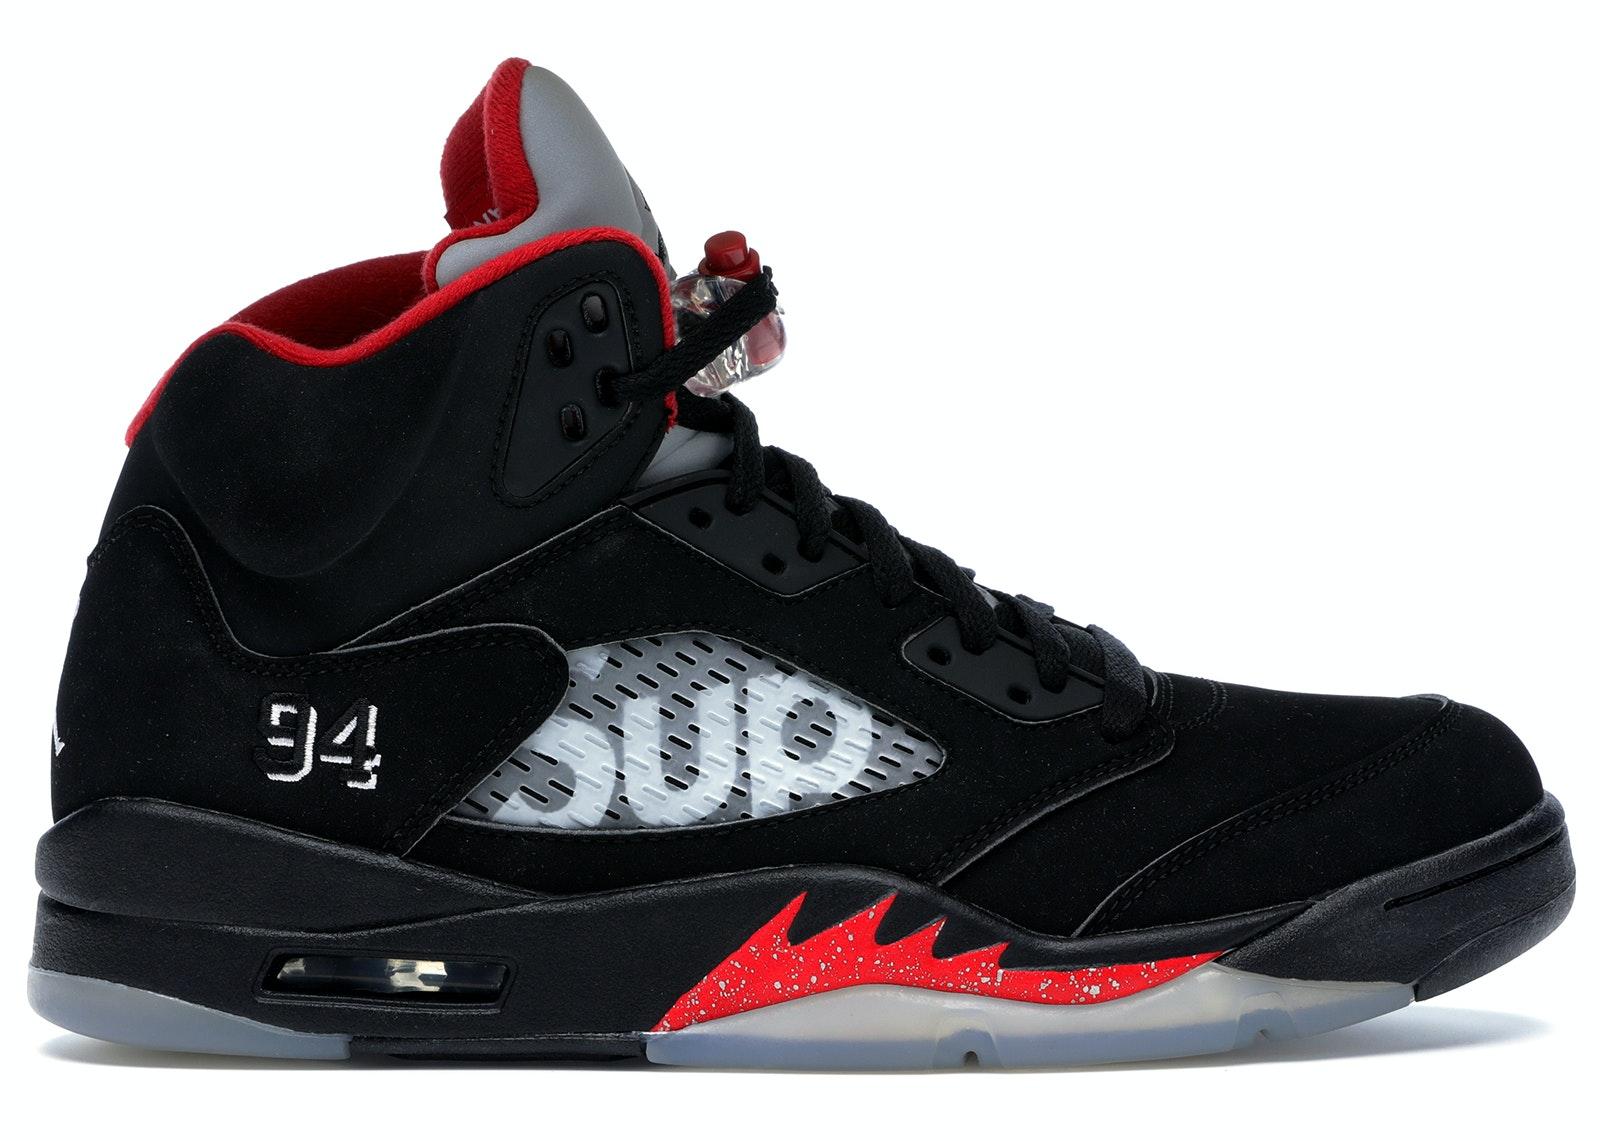 Retro 5 Jordans Black